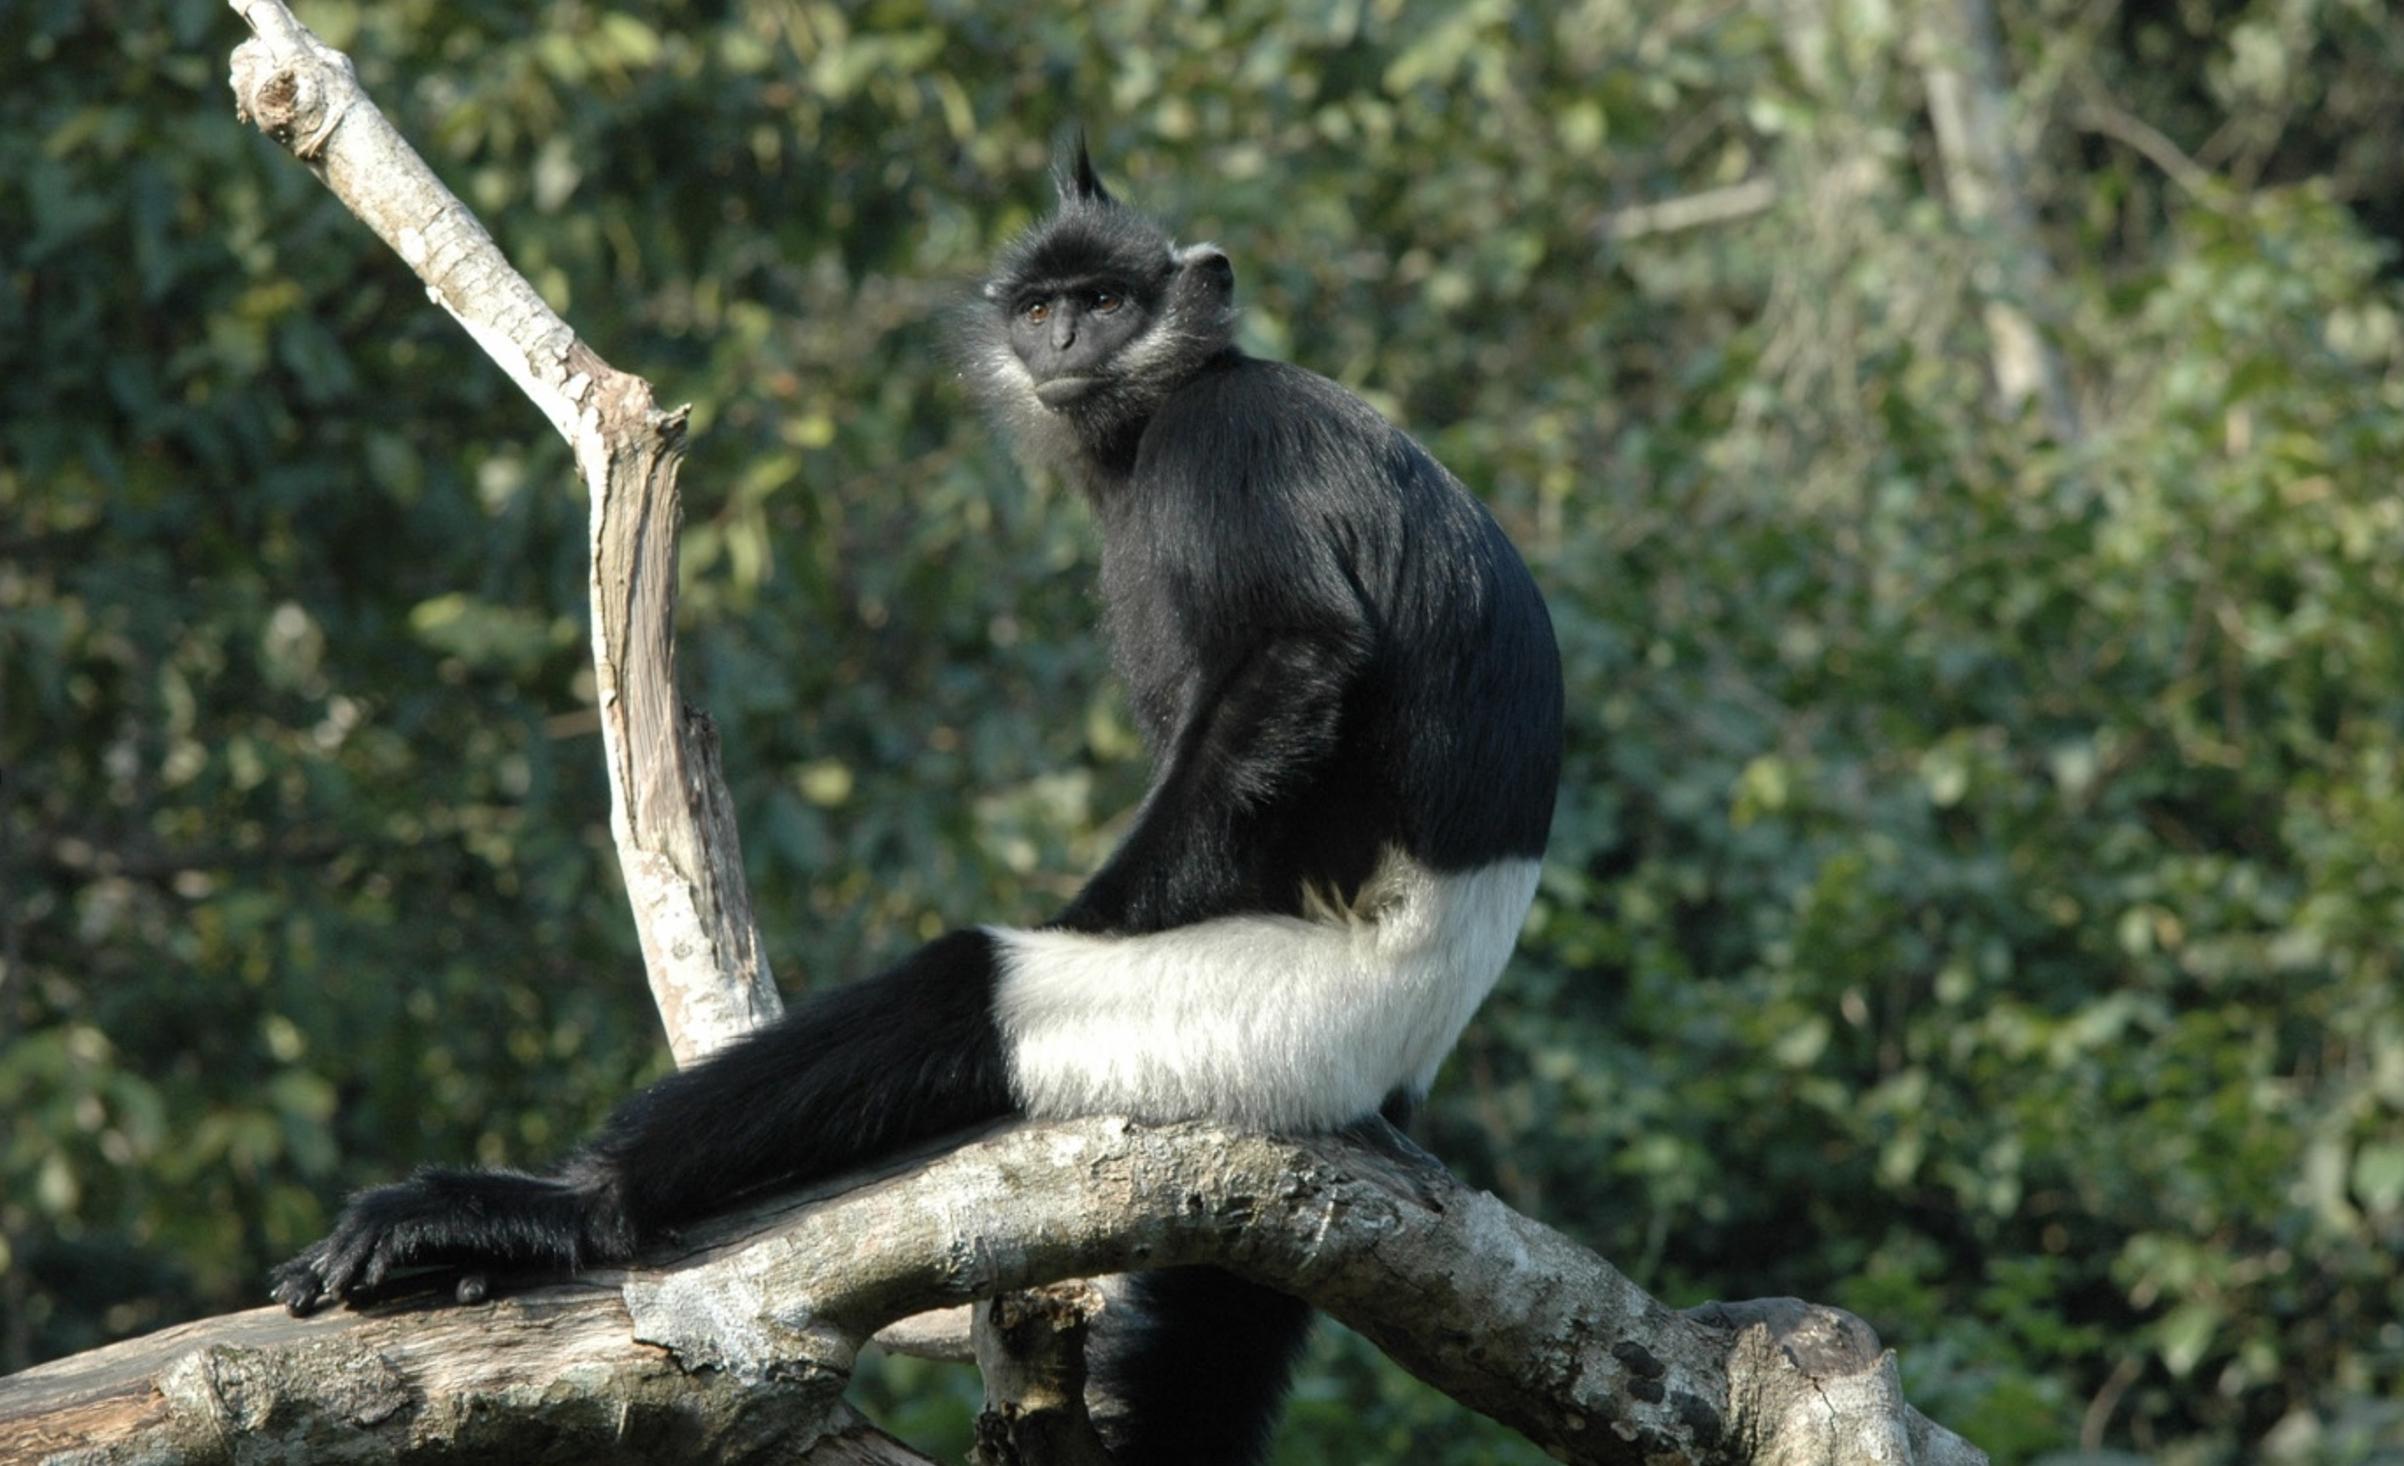 Fewer than 300 Delacour's langurs (Trachypithecus delacouri) remain today. Image by Tilo Nadler/Endangered Primate Rescue Center.